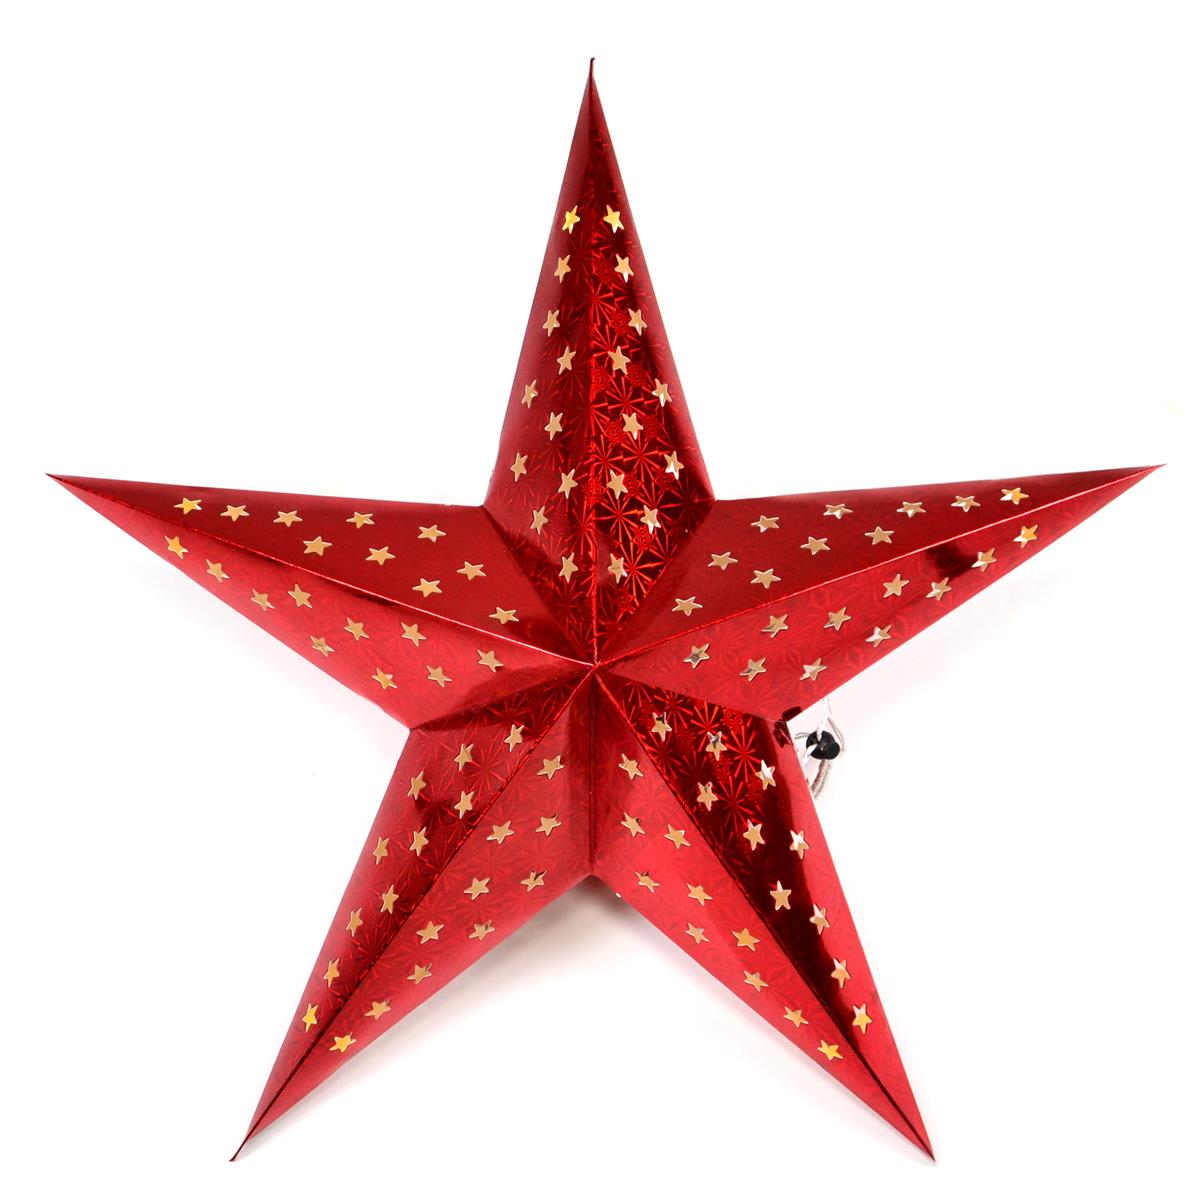 Papierstern 3D 10 LED rot Weihnachtsstern Faltstern Batterie mit Timer 5 Zacken